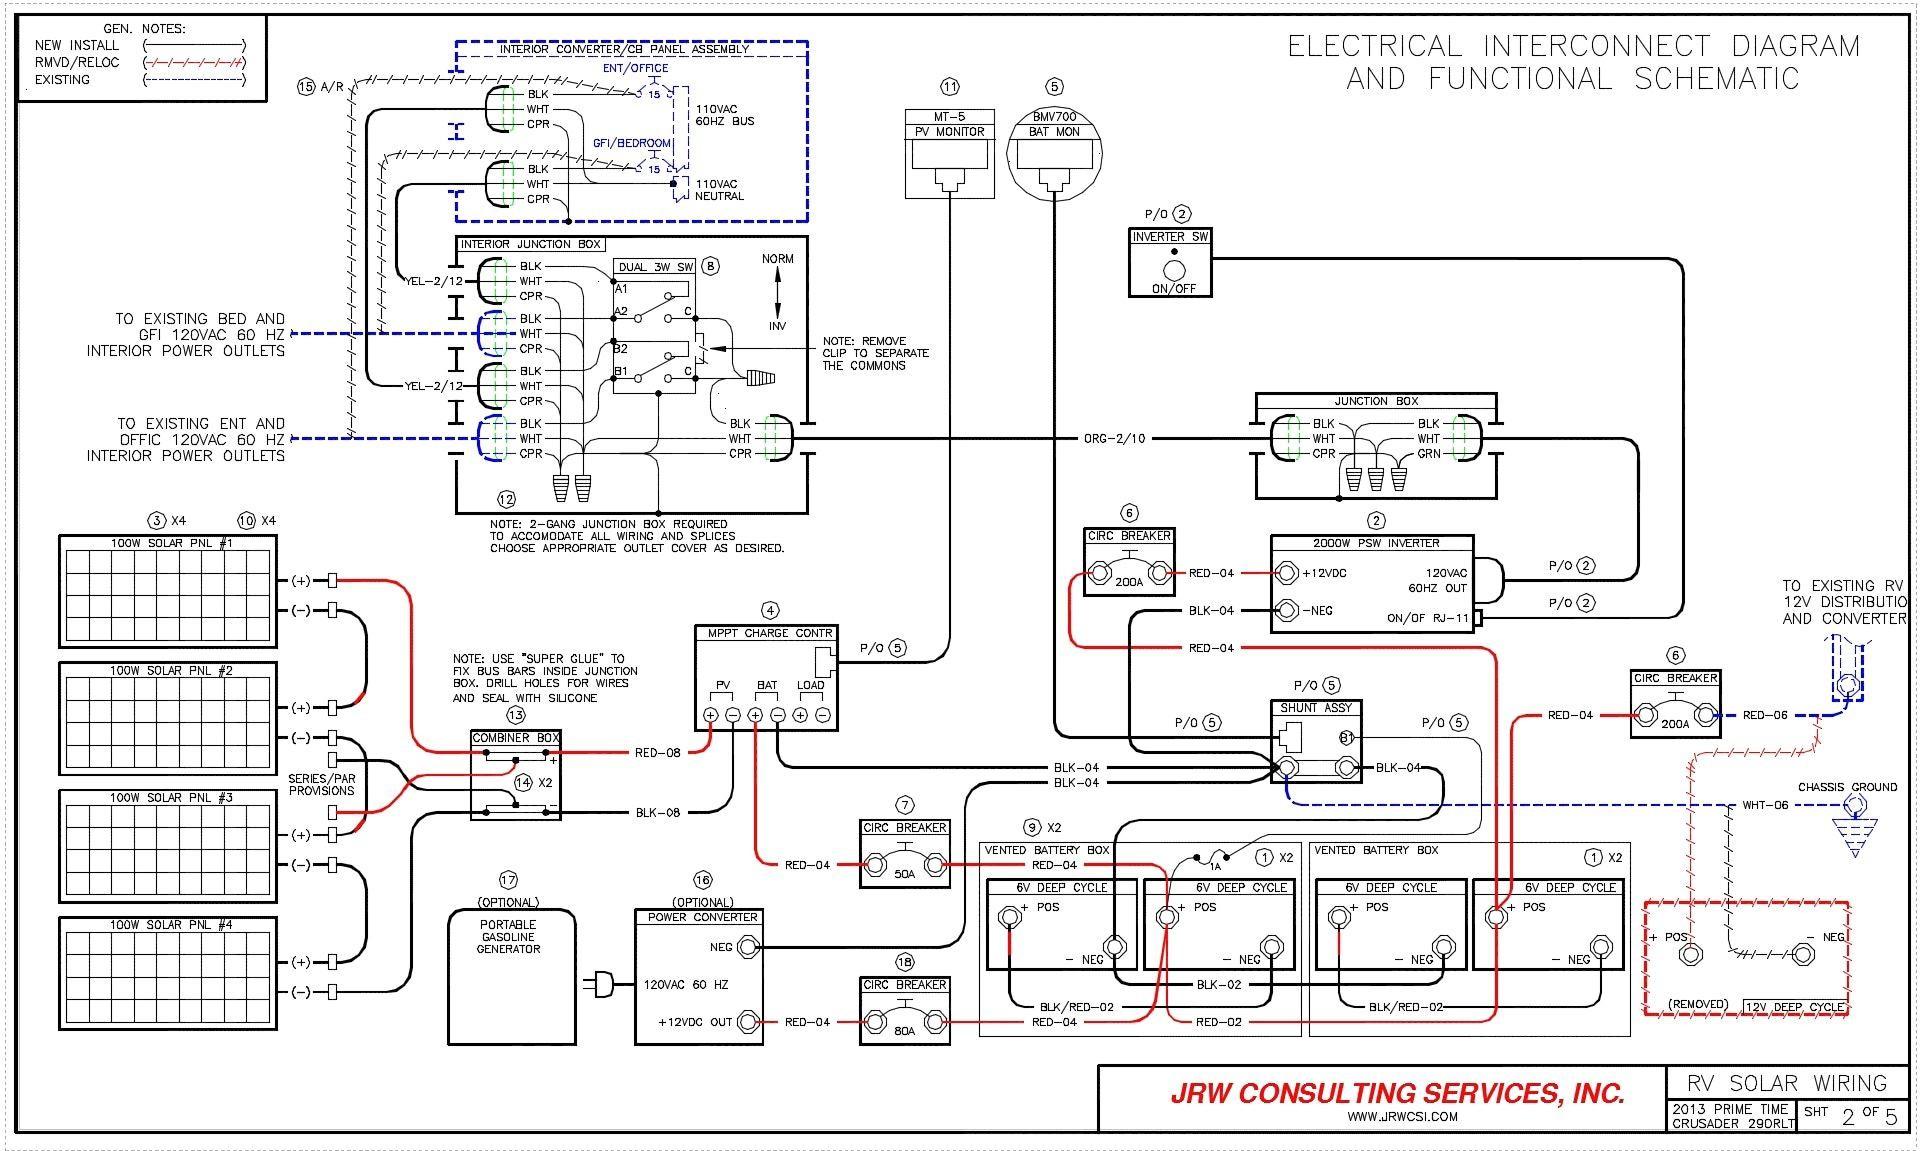 Rv Battery Isolator Wiring Diagram New Rv Wiring Diagrams Rv Ac Marine AC Wiring RV Heater Wiring Rv Ac Wiring